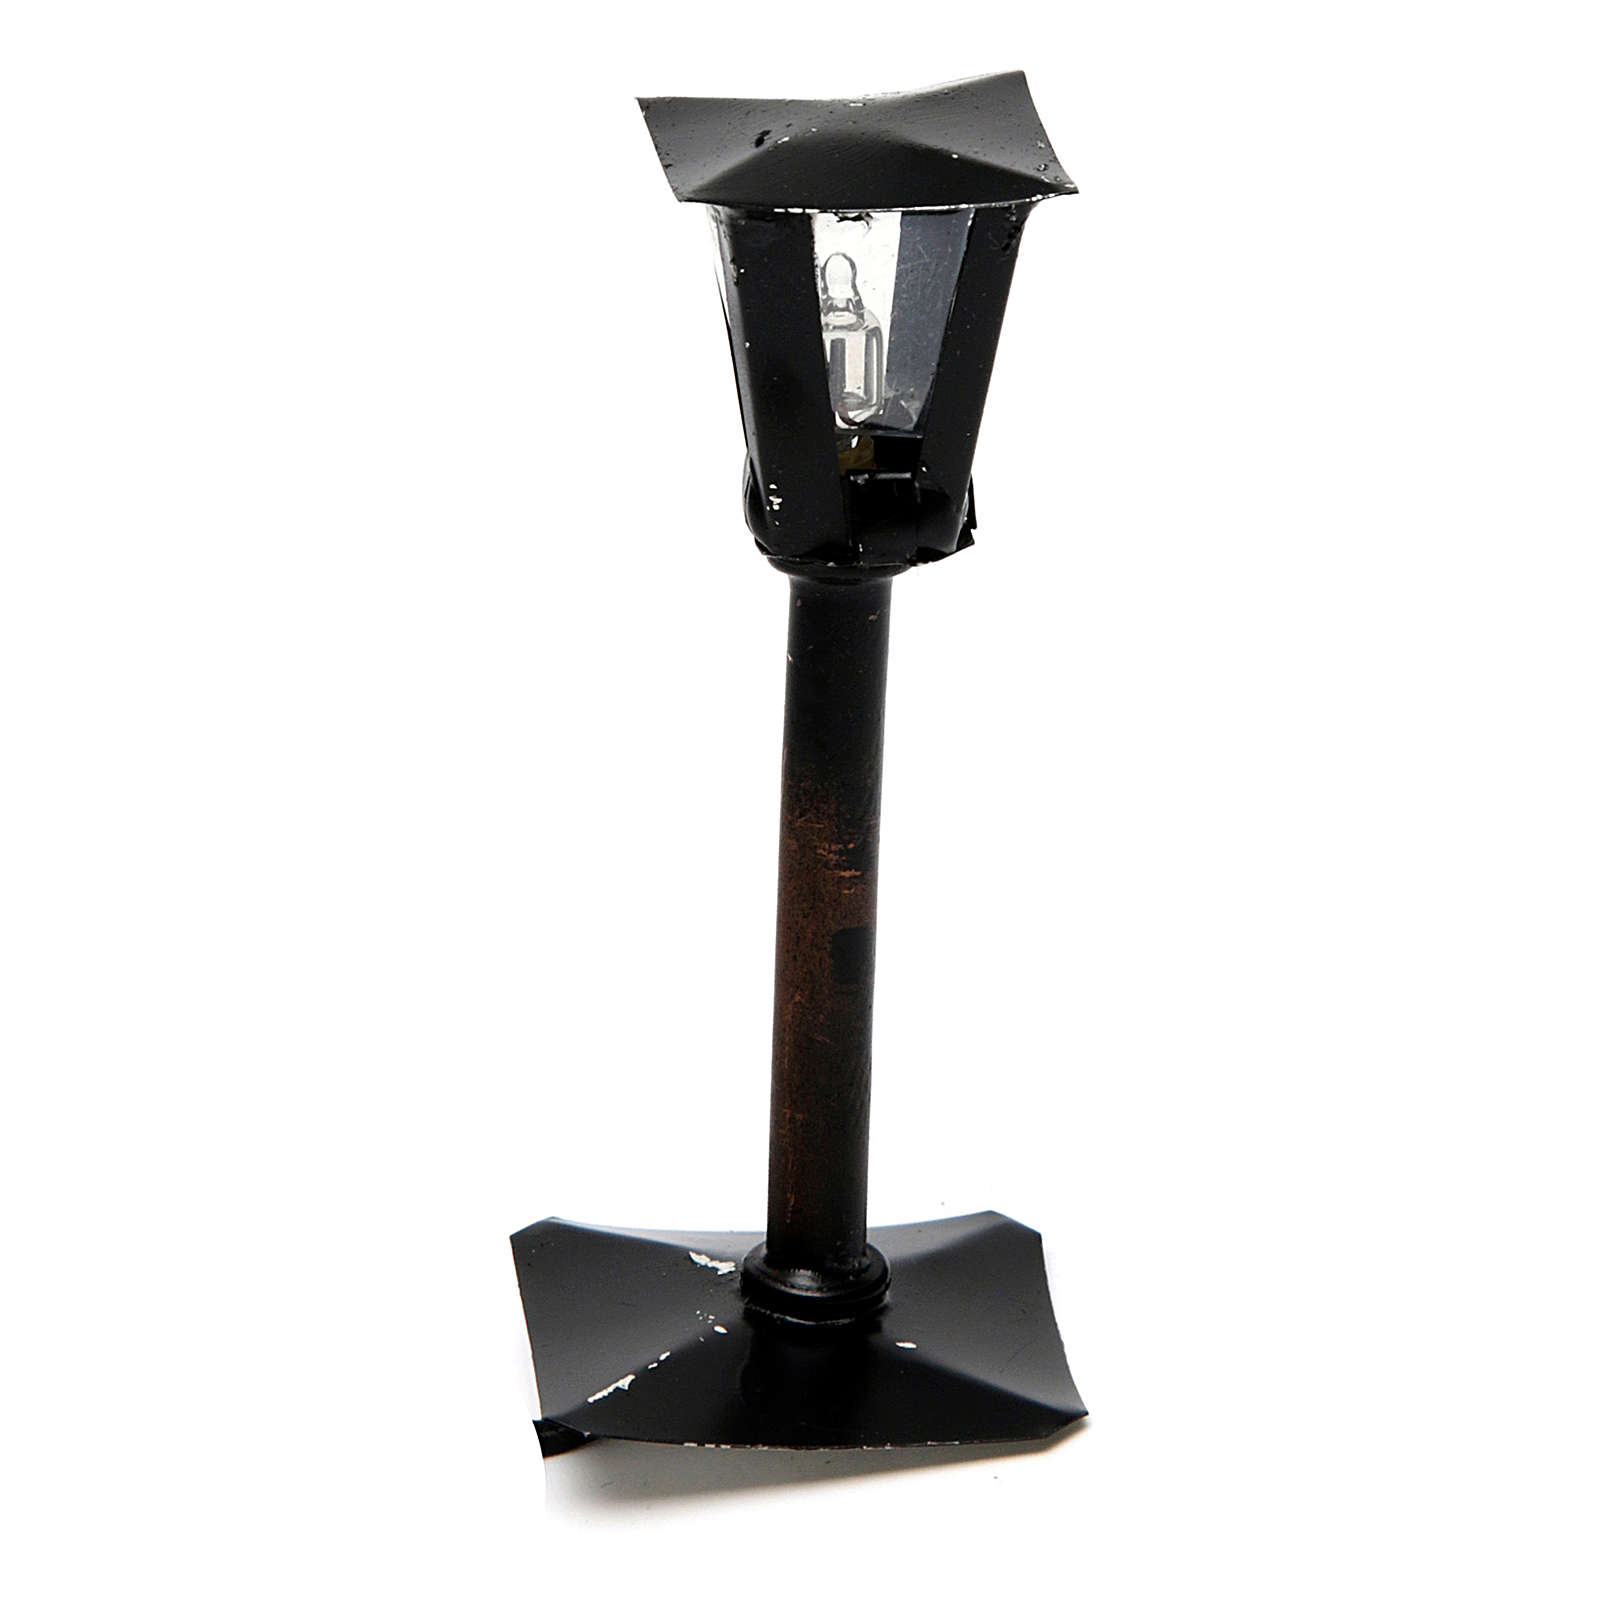 Latarnia uliczna z lampionem szopka zrób to sam 8 cm - 12V 4